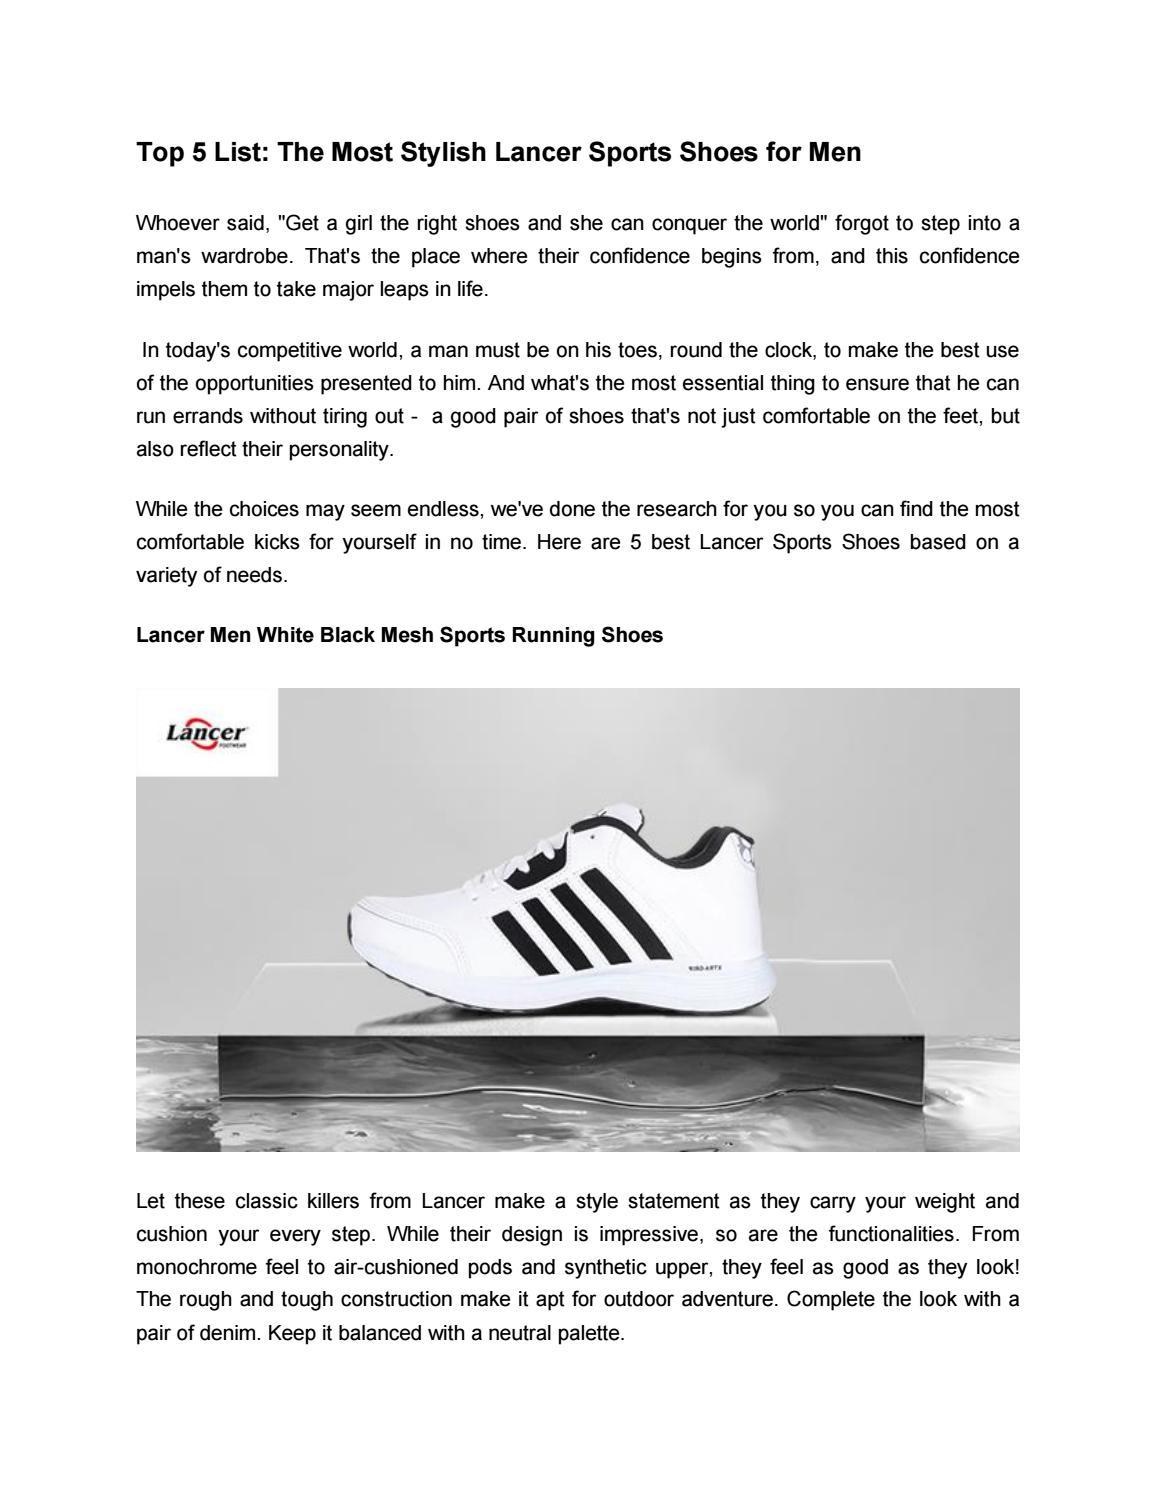 Most Stylish Lancer Sports Shoes